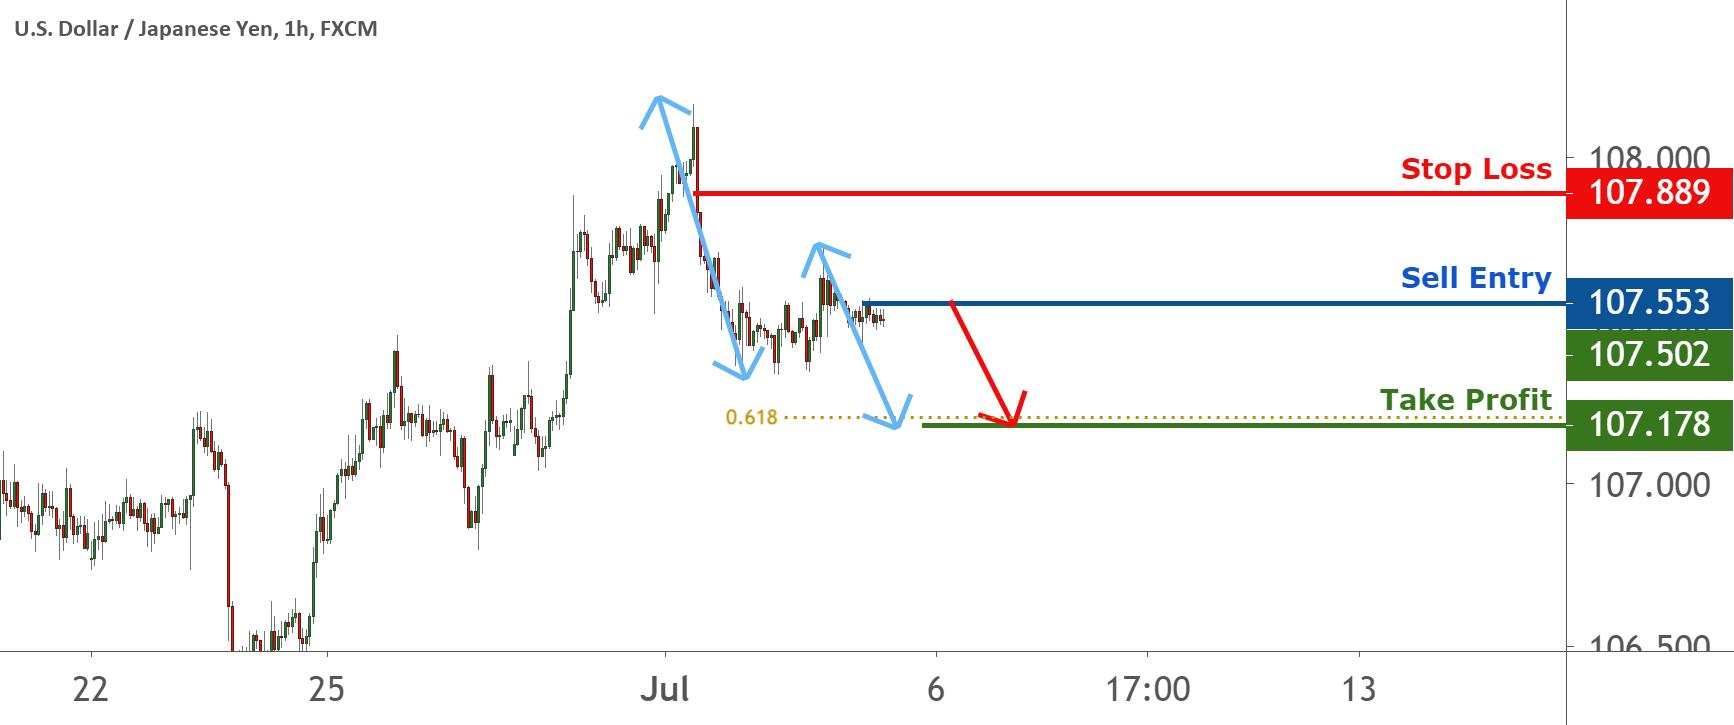 Possible trend shift in USDJPY – going short for FX:USDJPY by FXCM